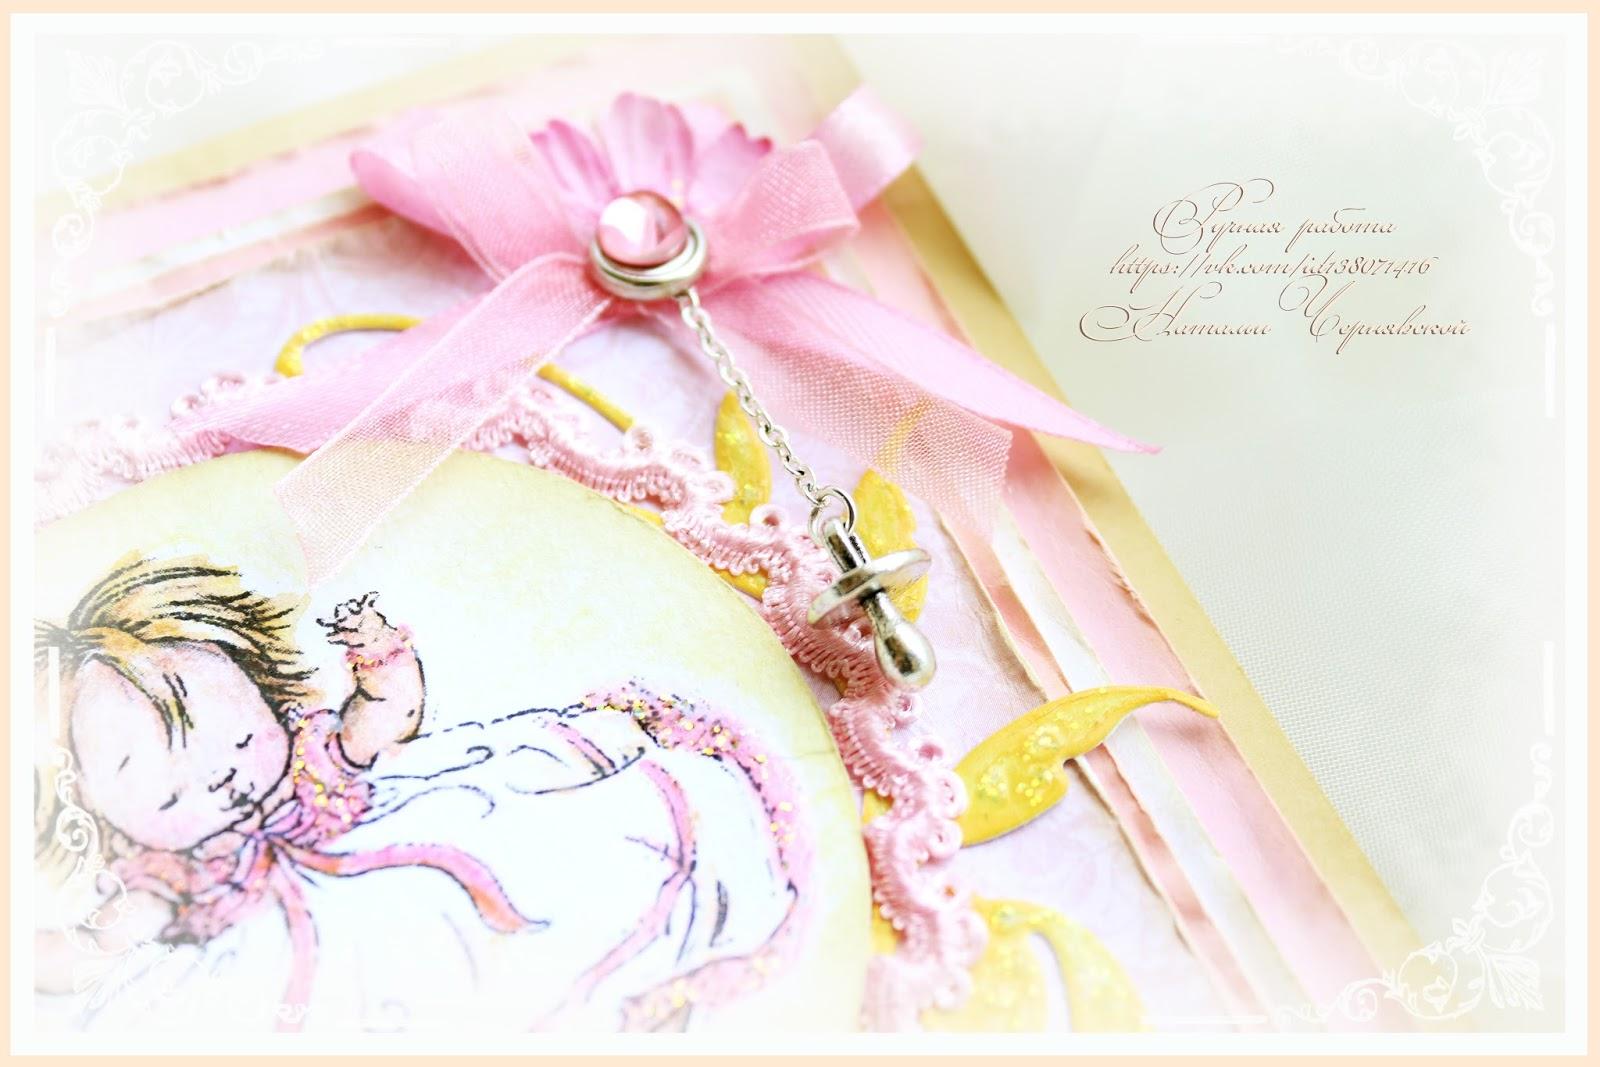 Открытка с днём рождения дочери фото